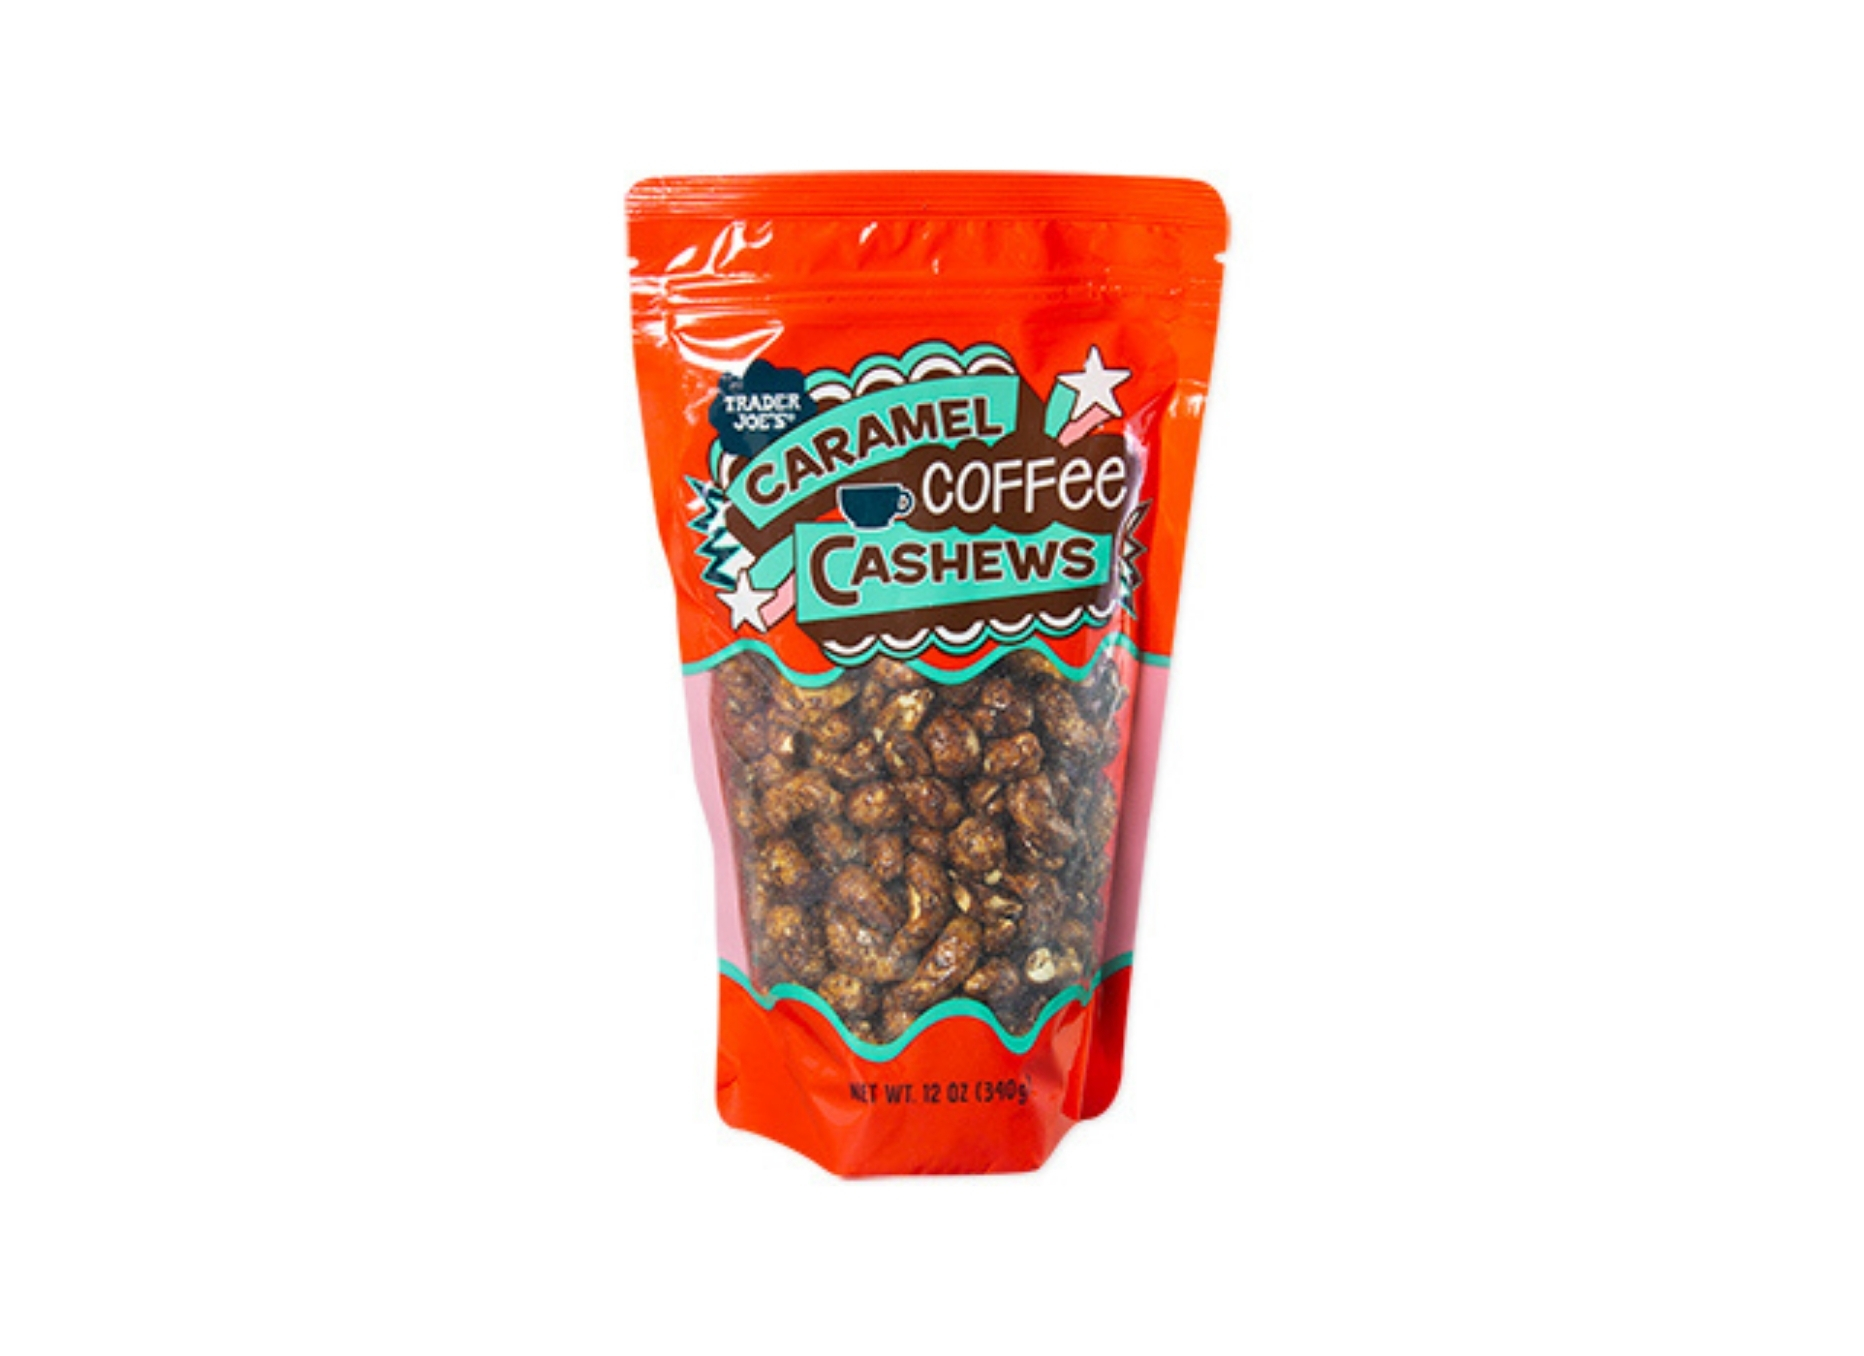 Caramel Coffee Cashews